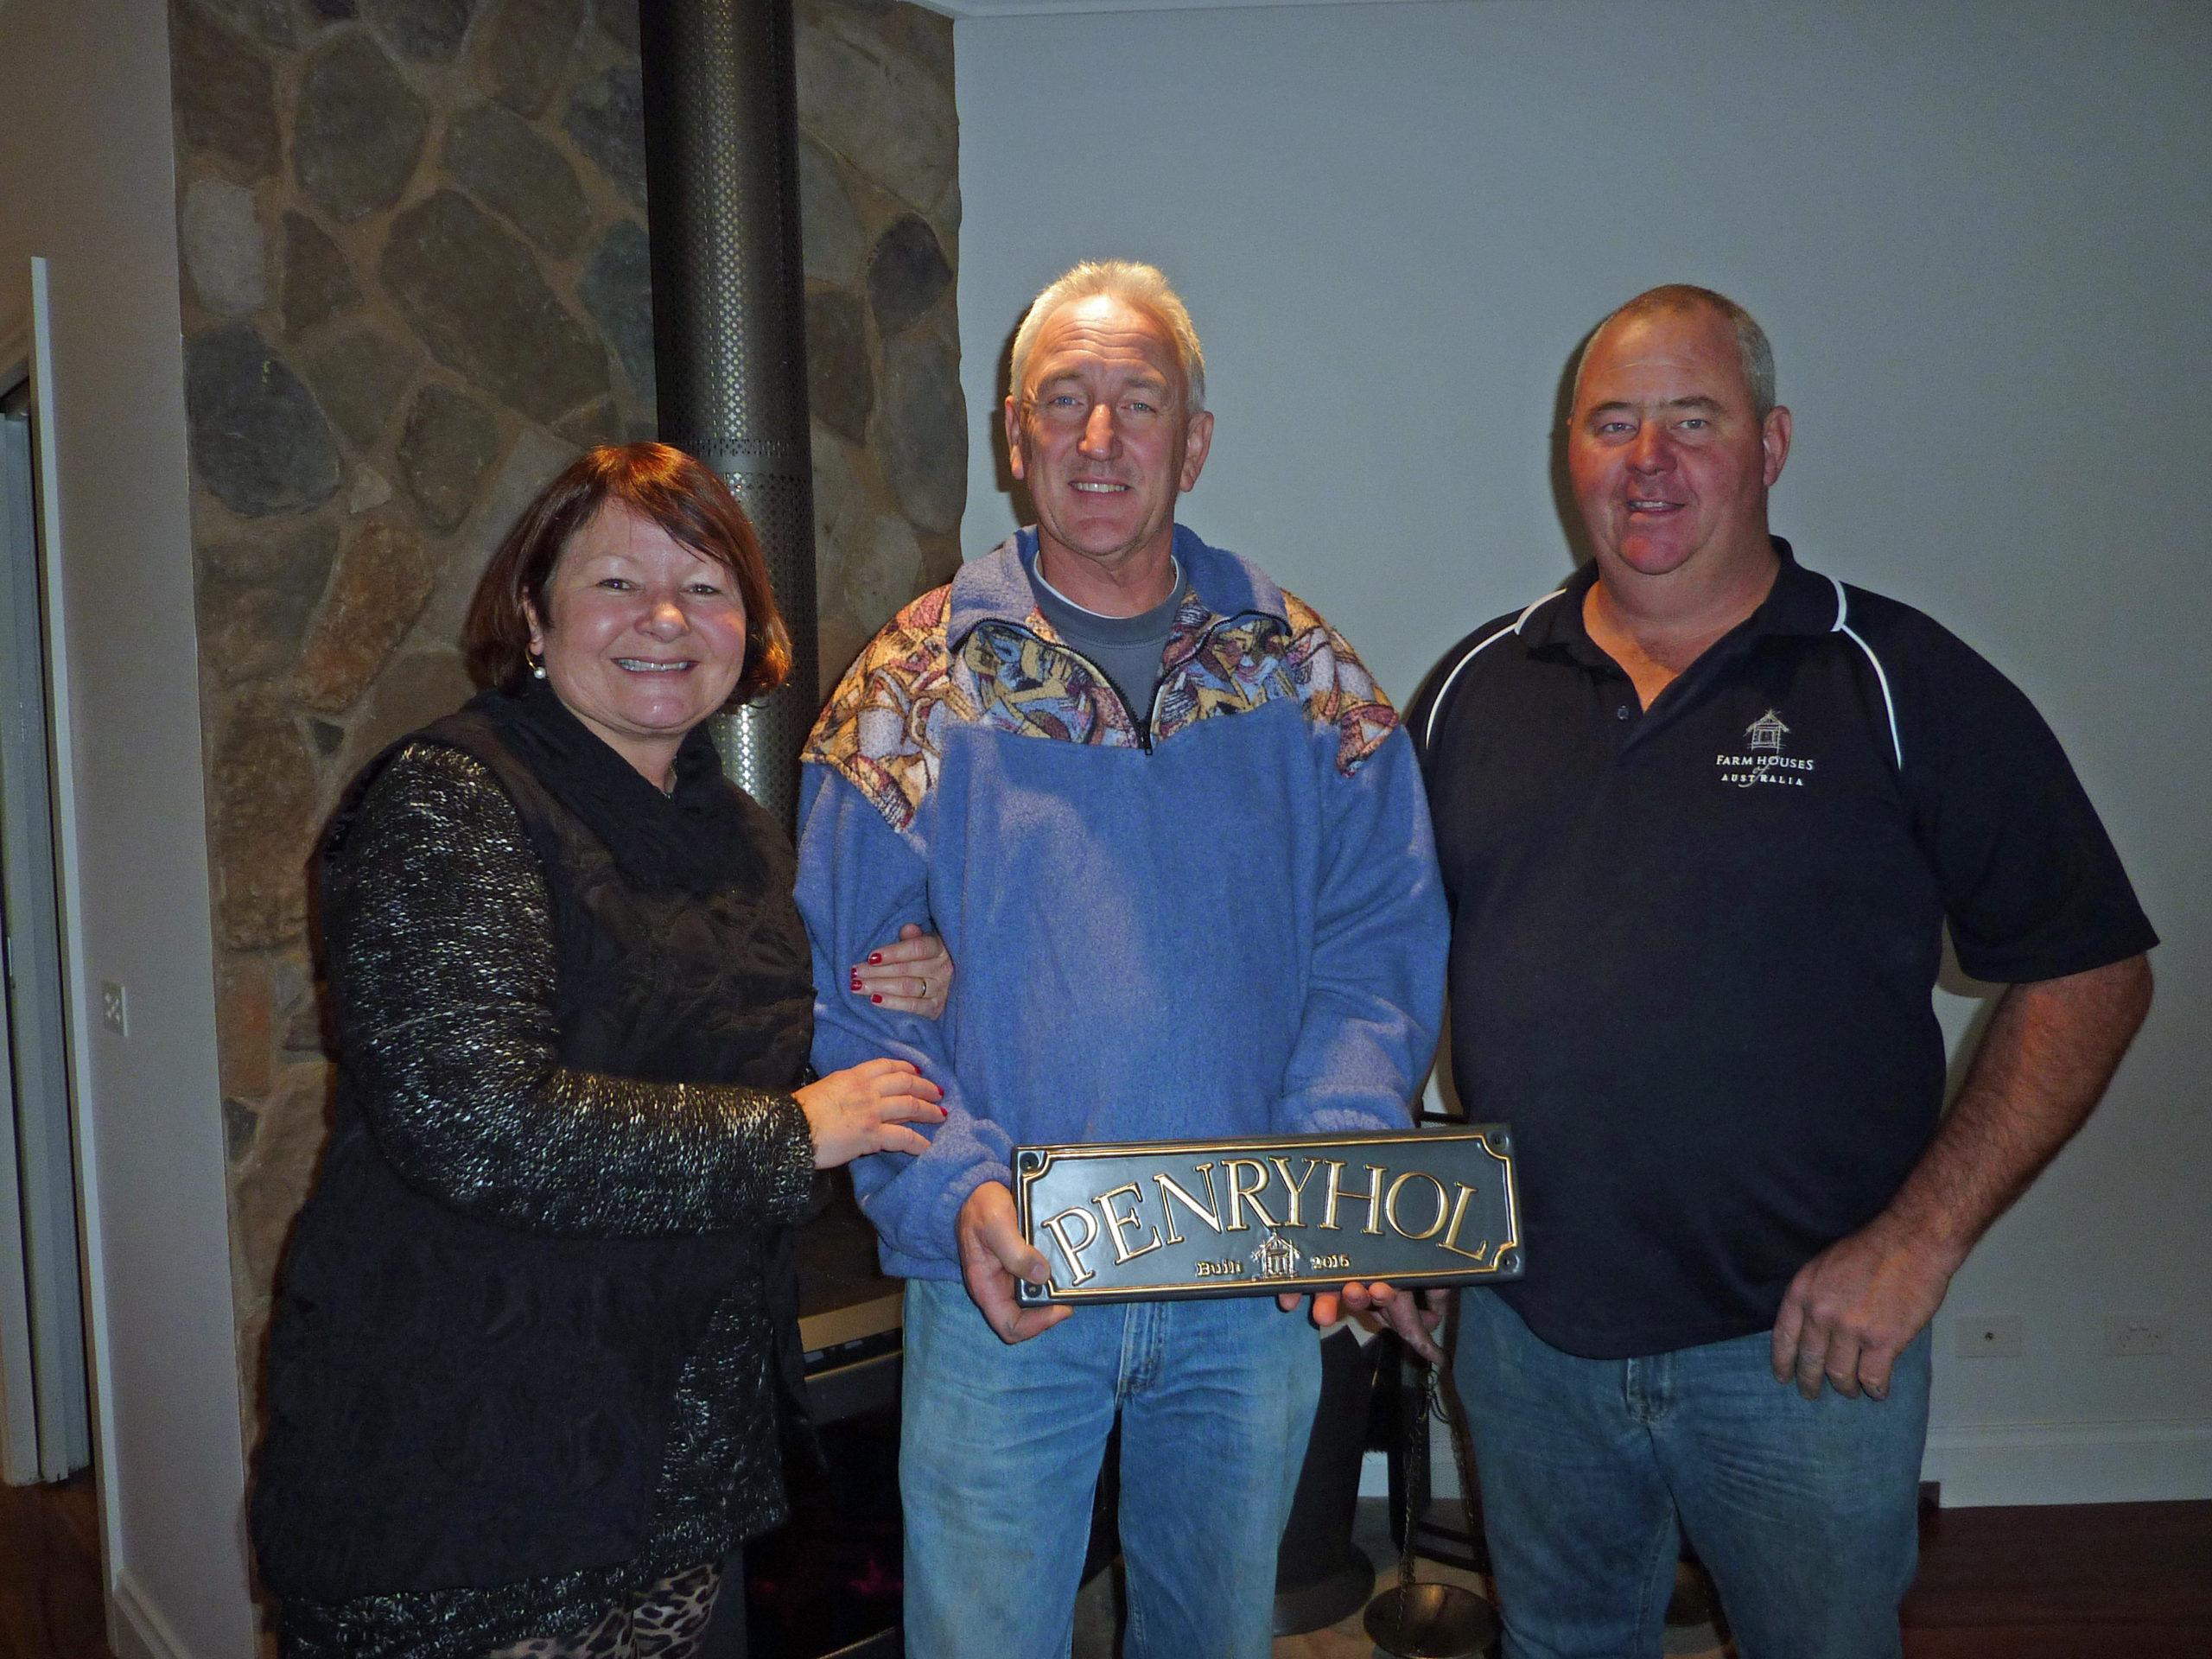 Penryhol - Caroline and Michael with Doug the builder - Farm Houses of Australia